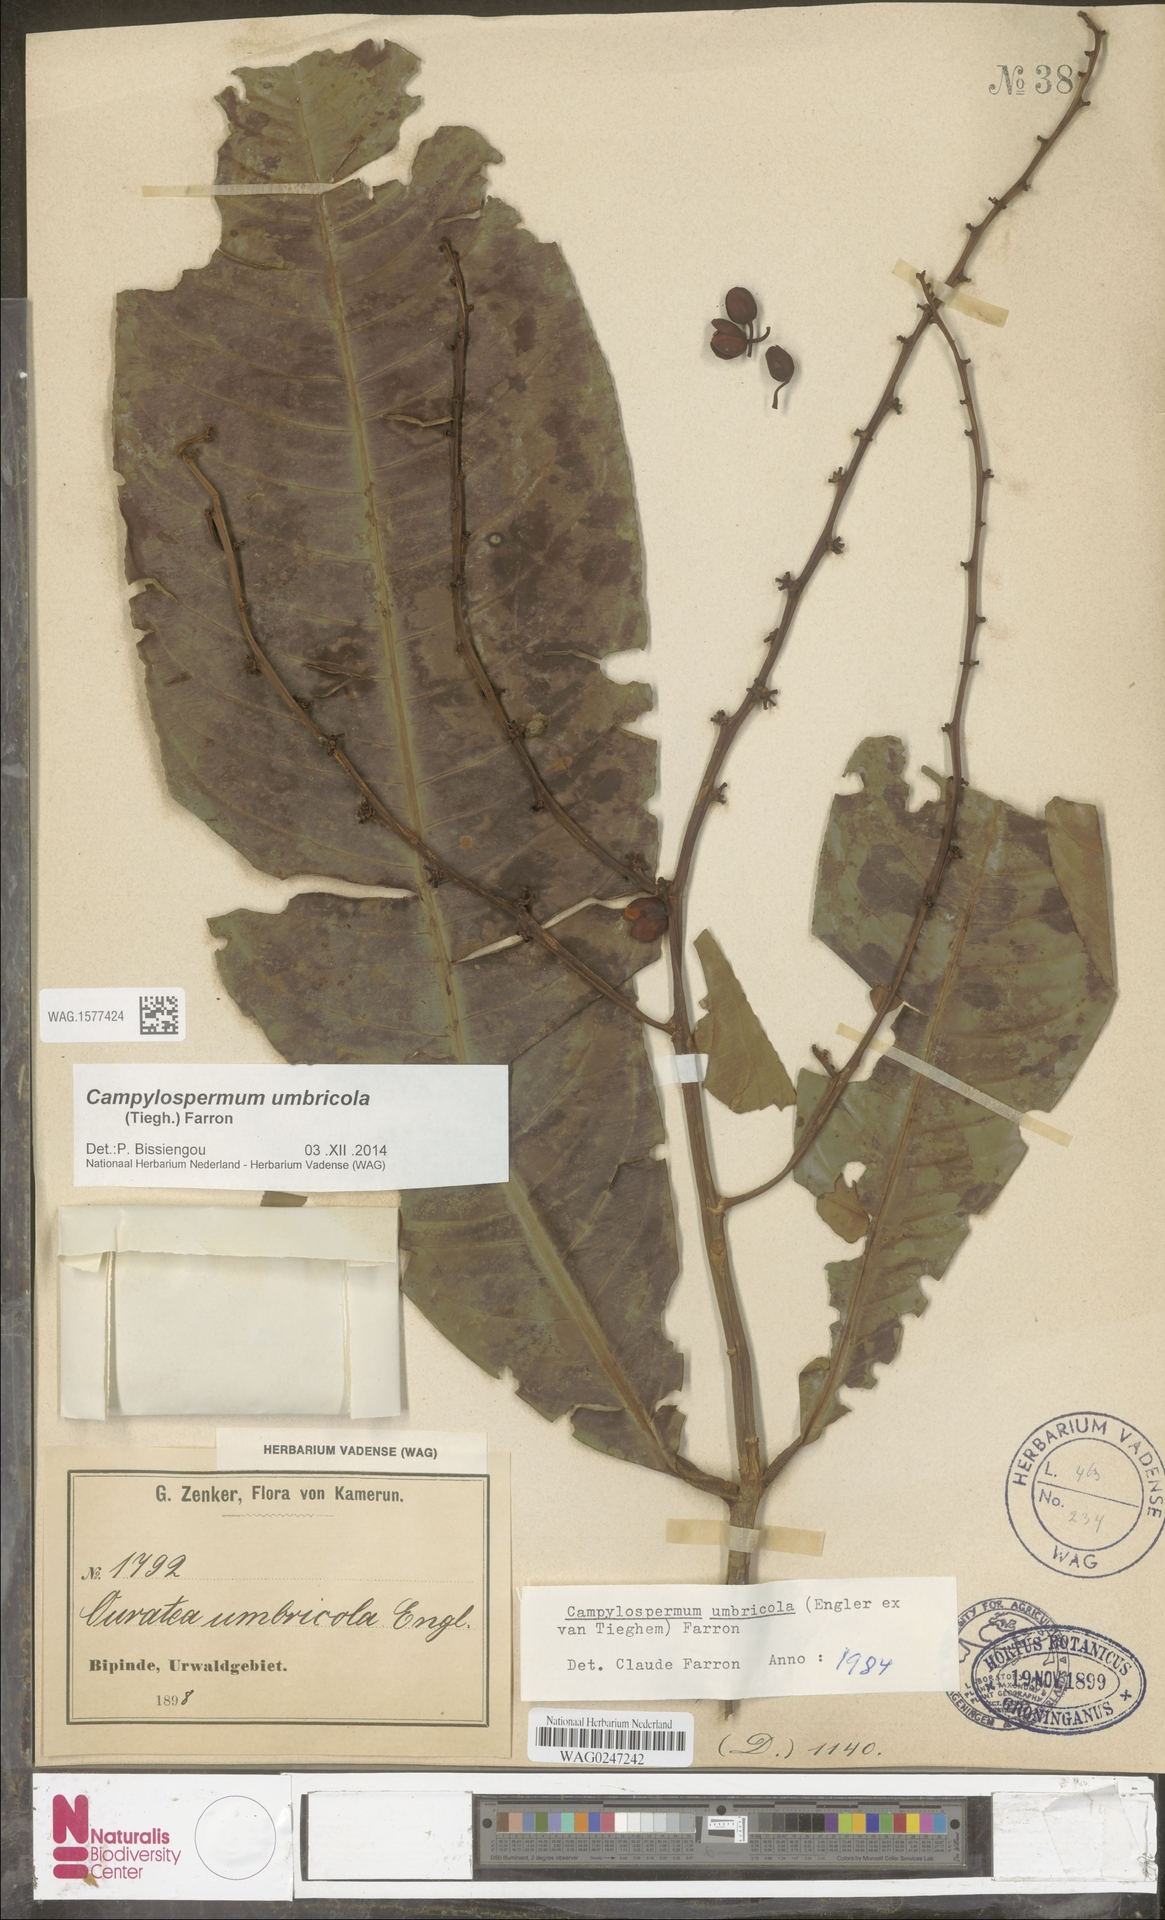 WAG.1577424 | Campylospermum umbricola (Tiegh.) Farron